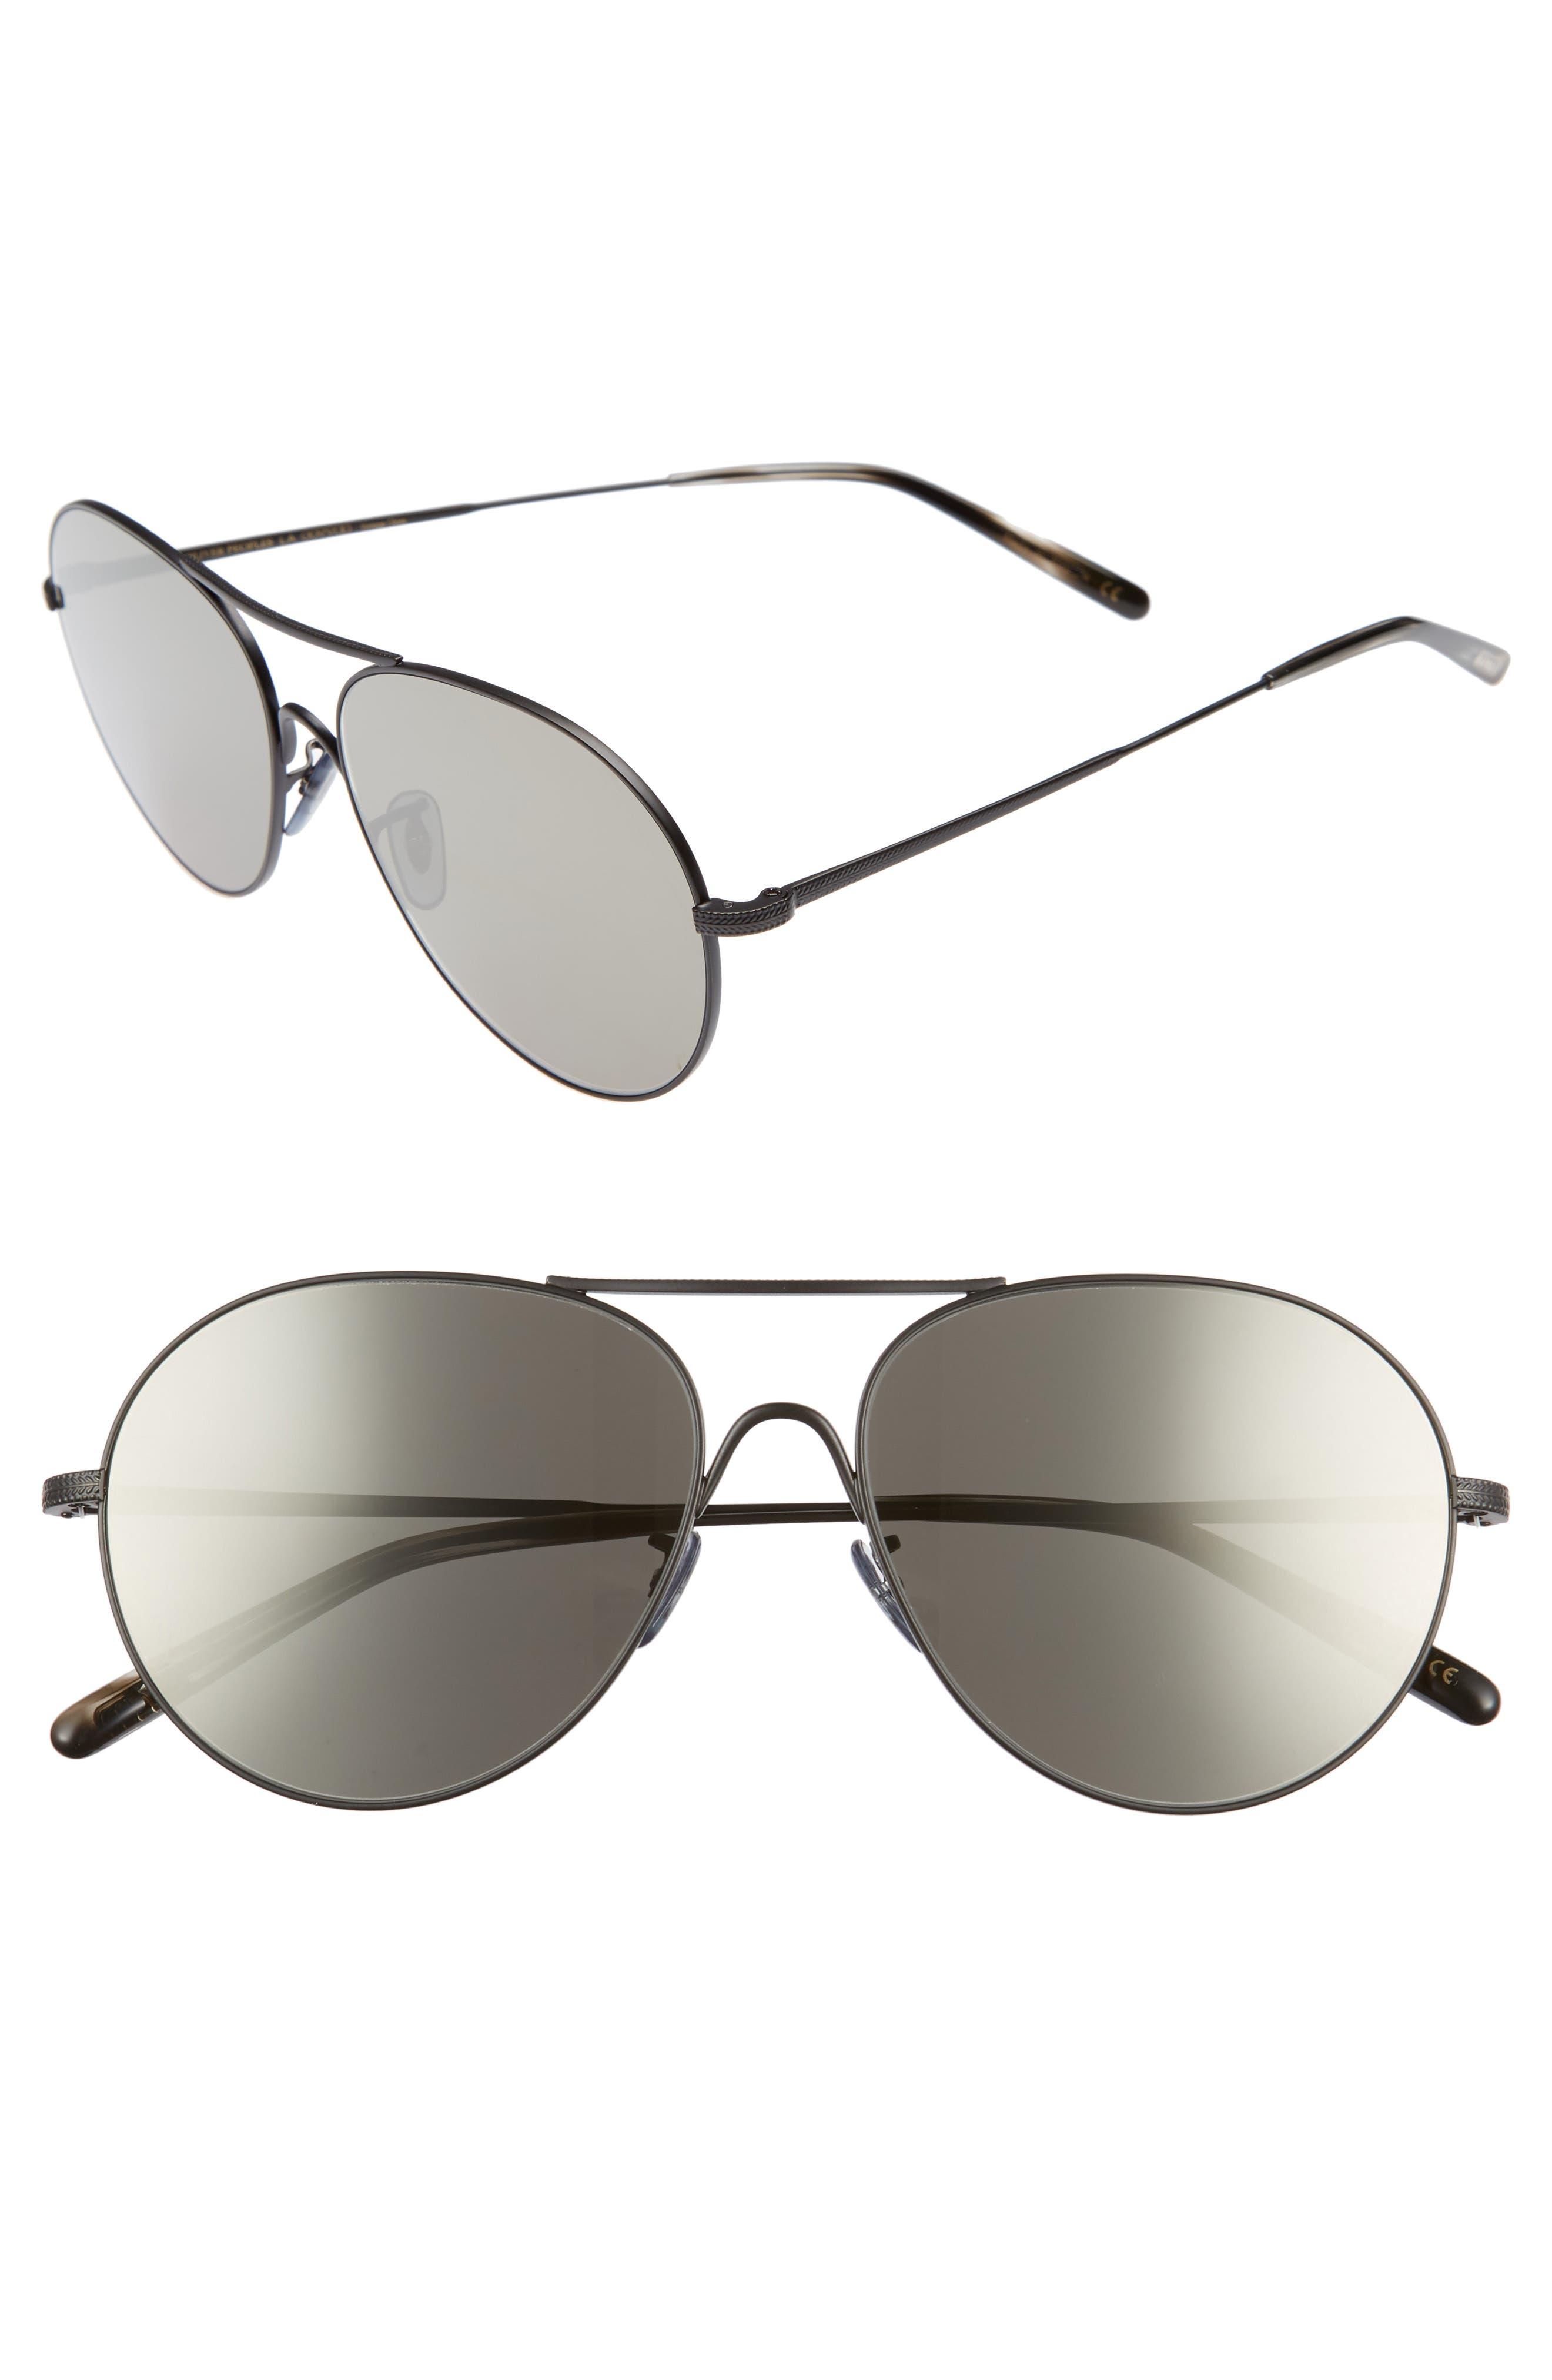 Rockmore 58mm Aviator Sunglasses,                         Main,                         color, GREY